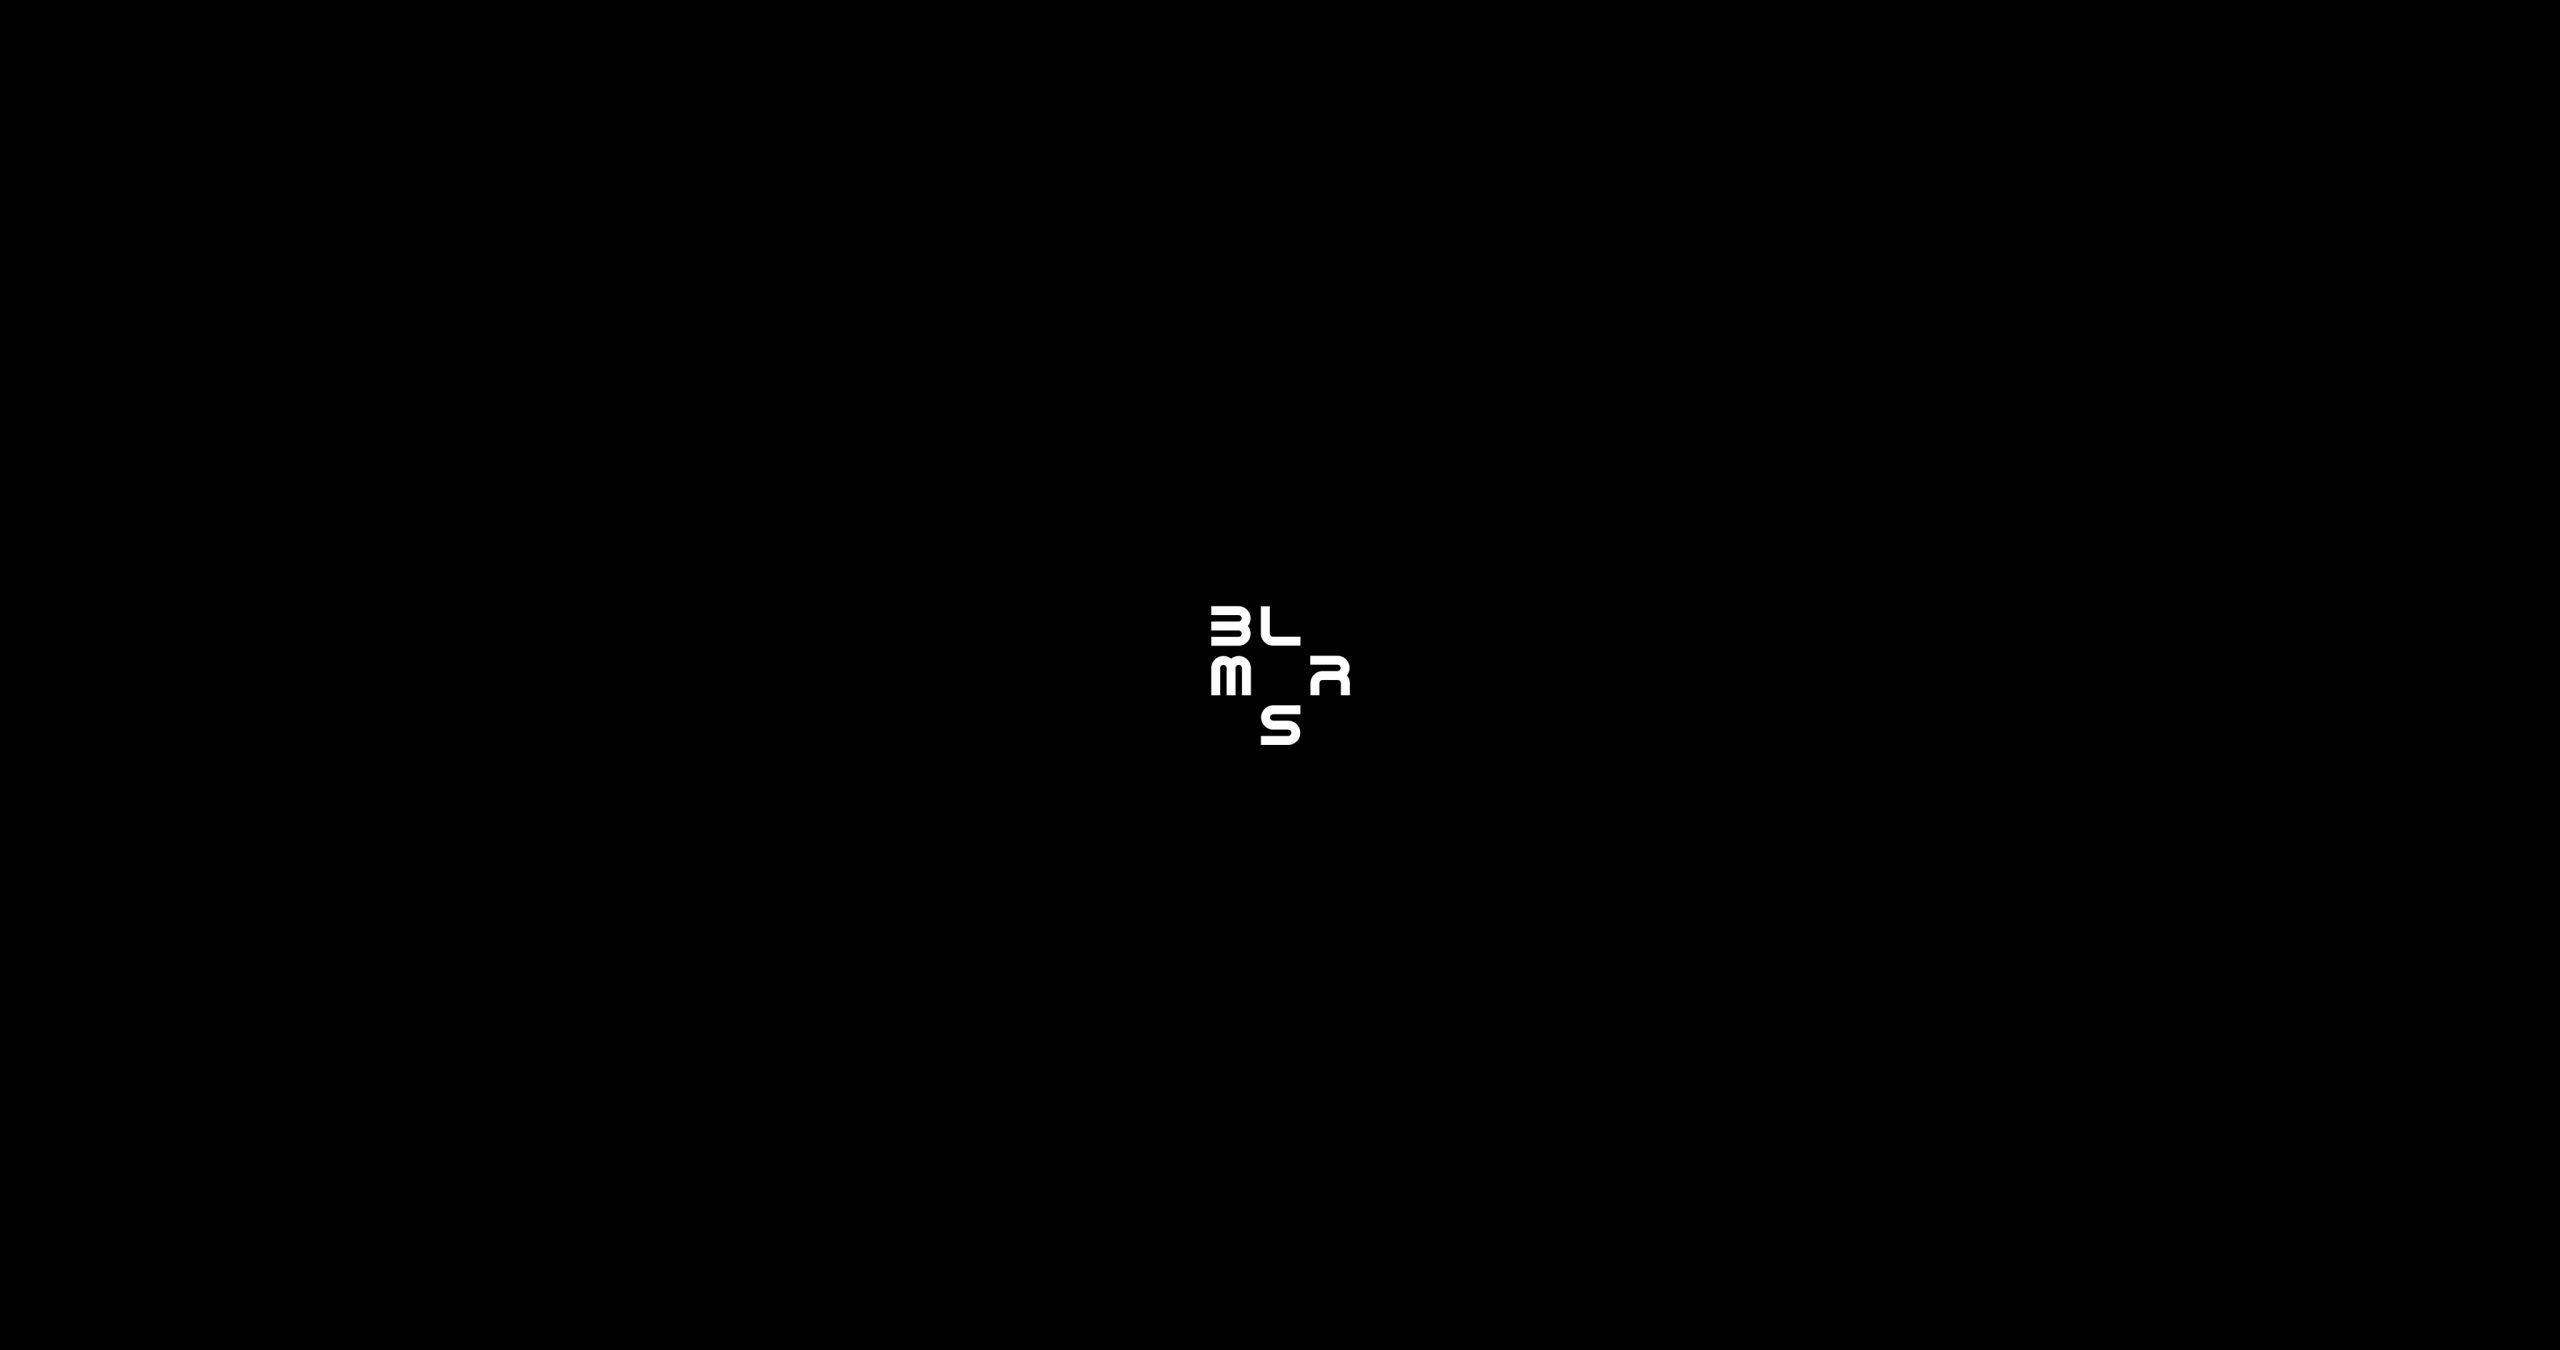 BLMRS_LOGO_2021_WallPaper_4K